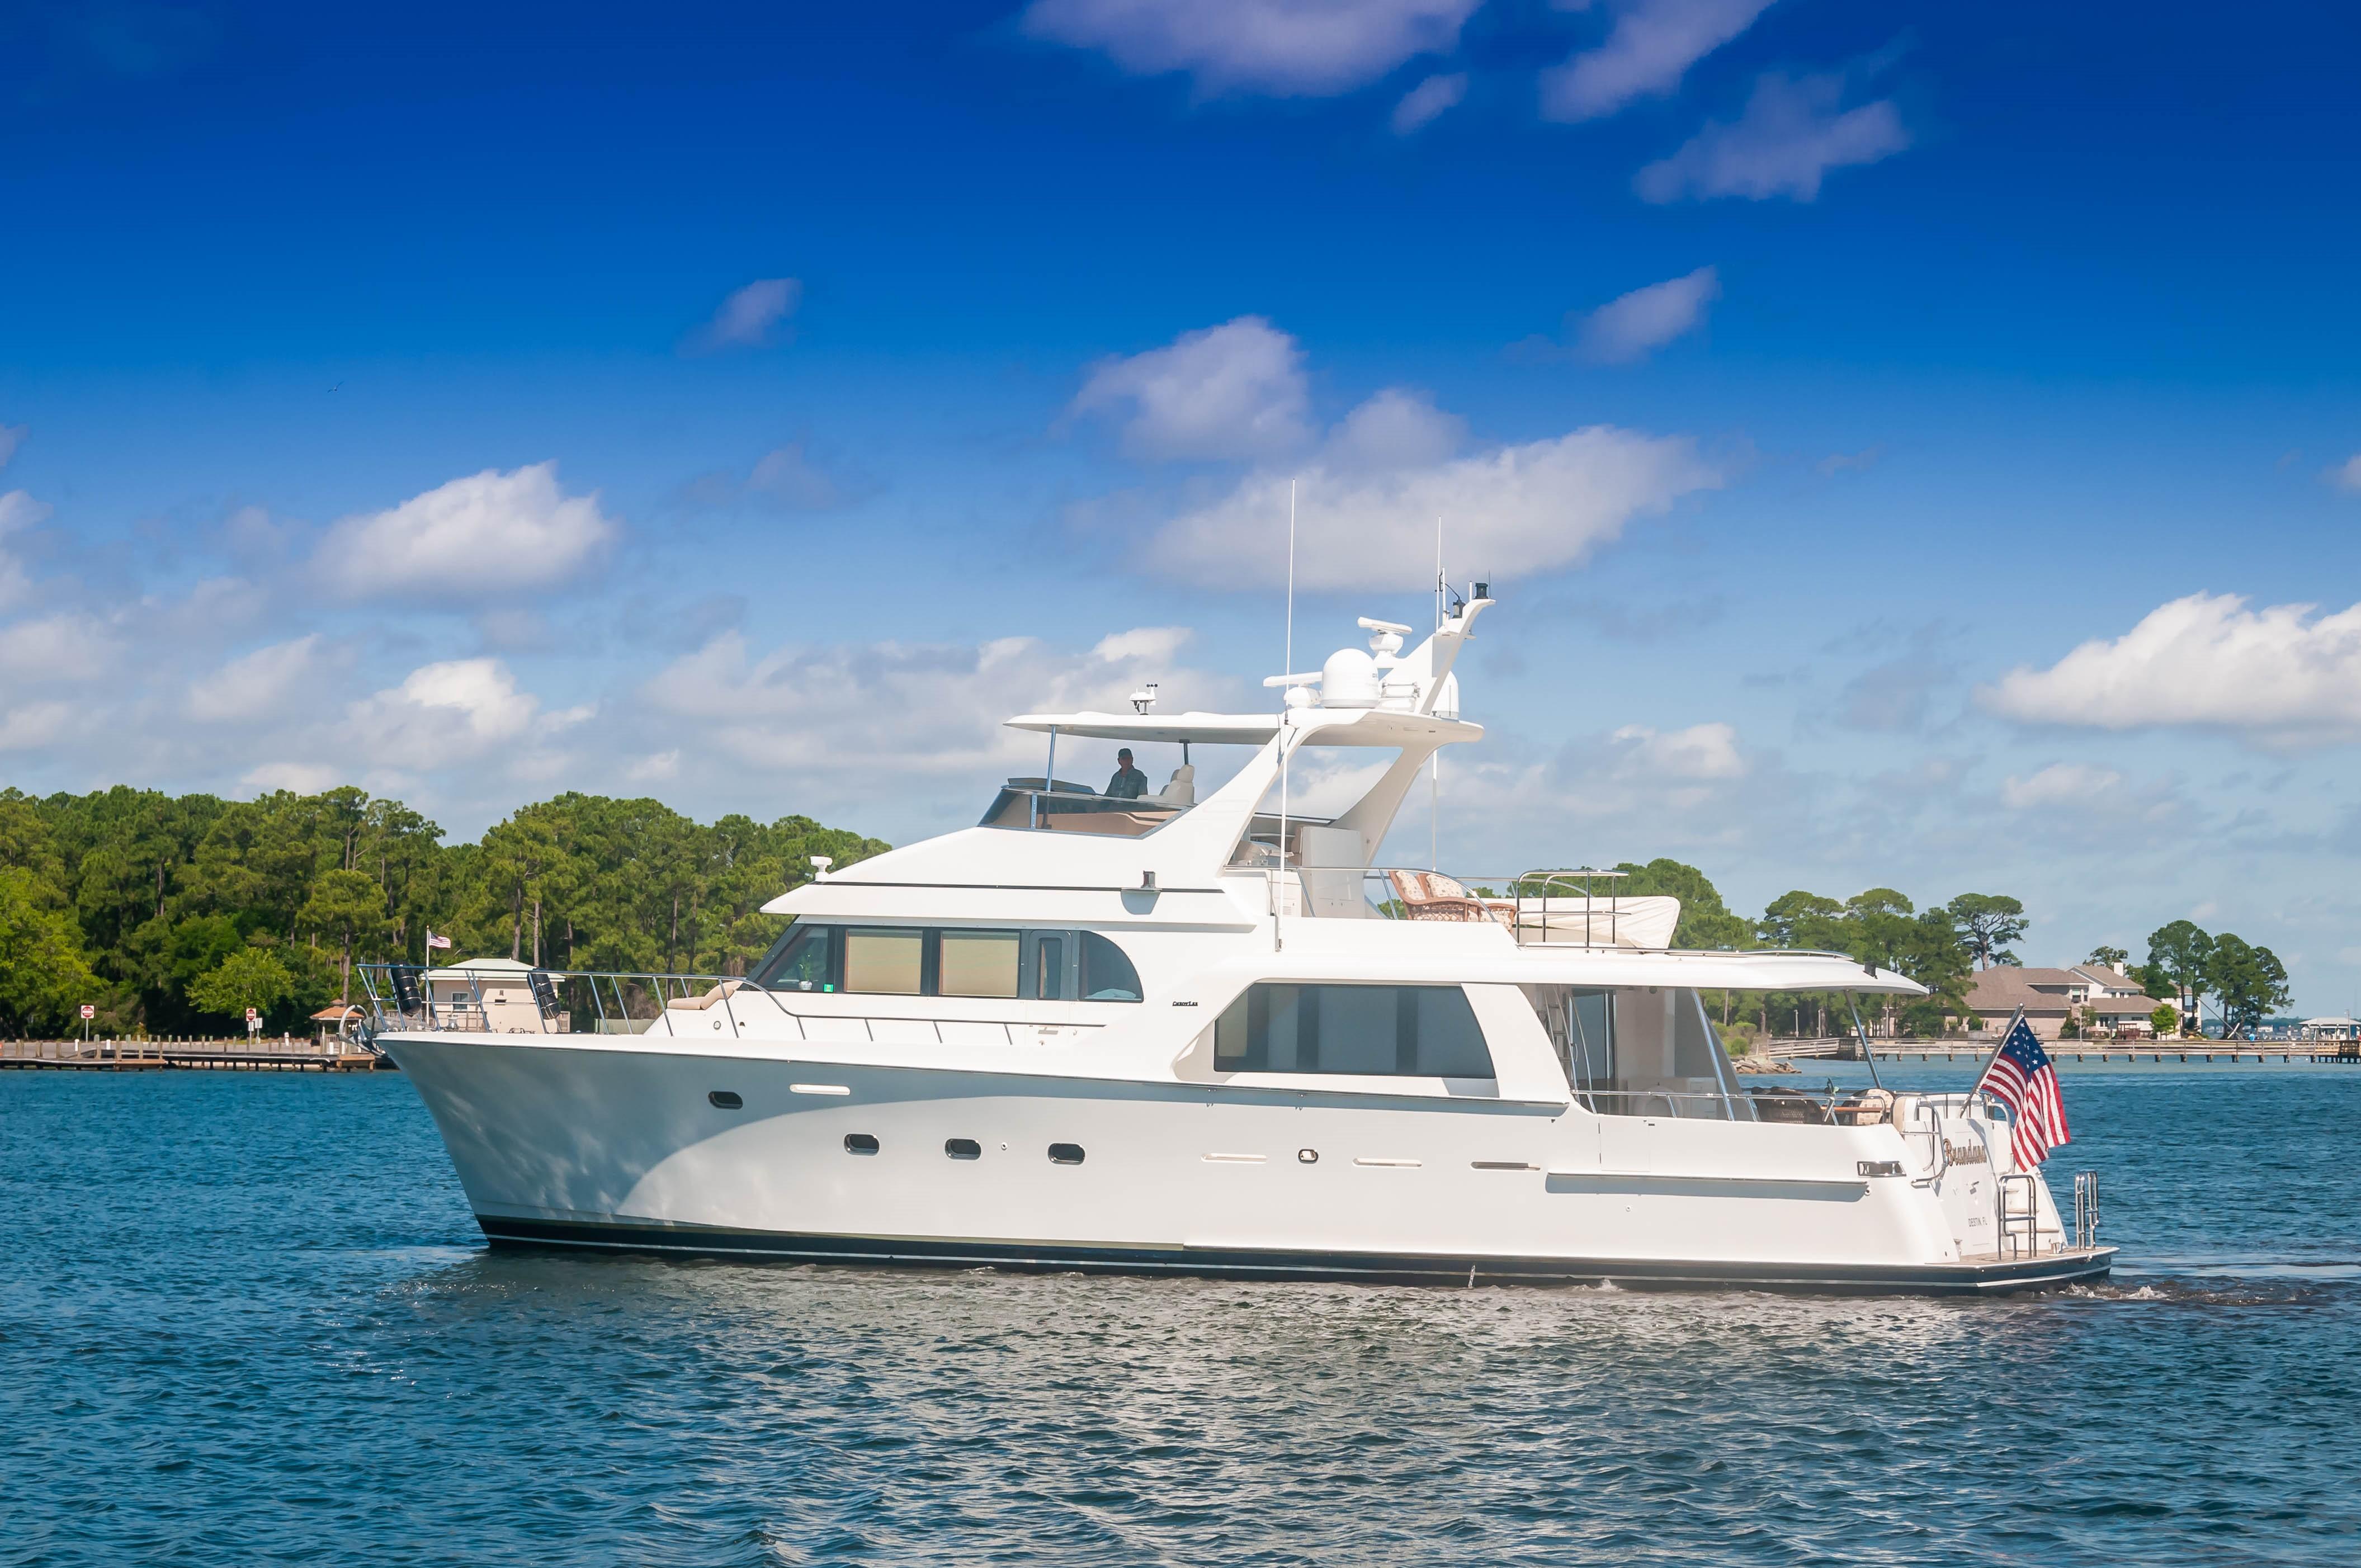 72 ft Cheoy Lee Pilothouse Motor Yacht